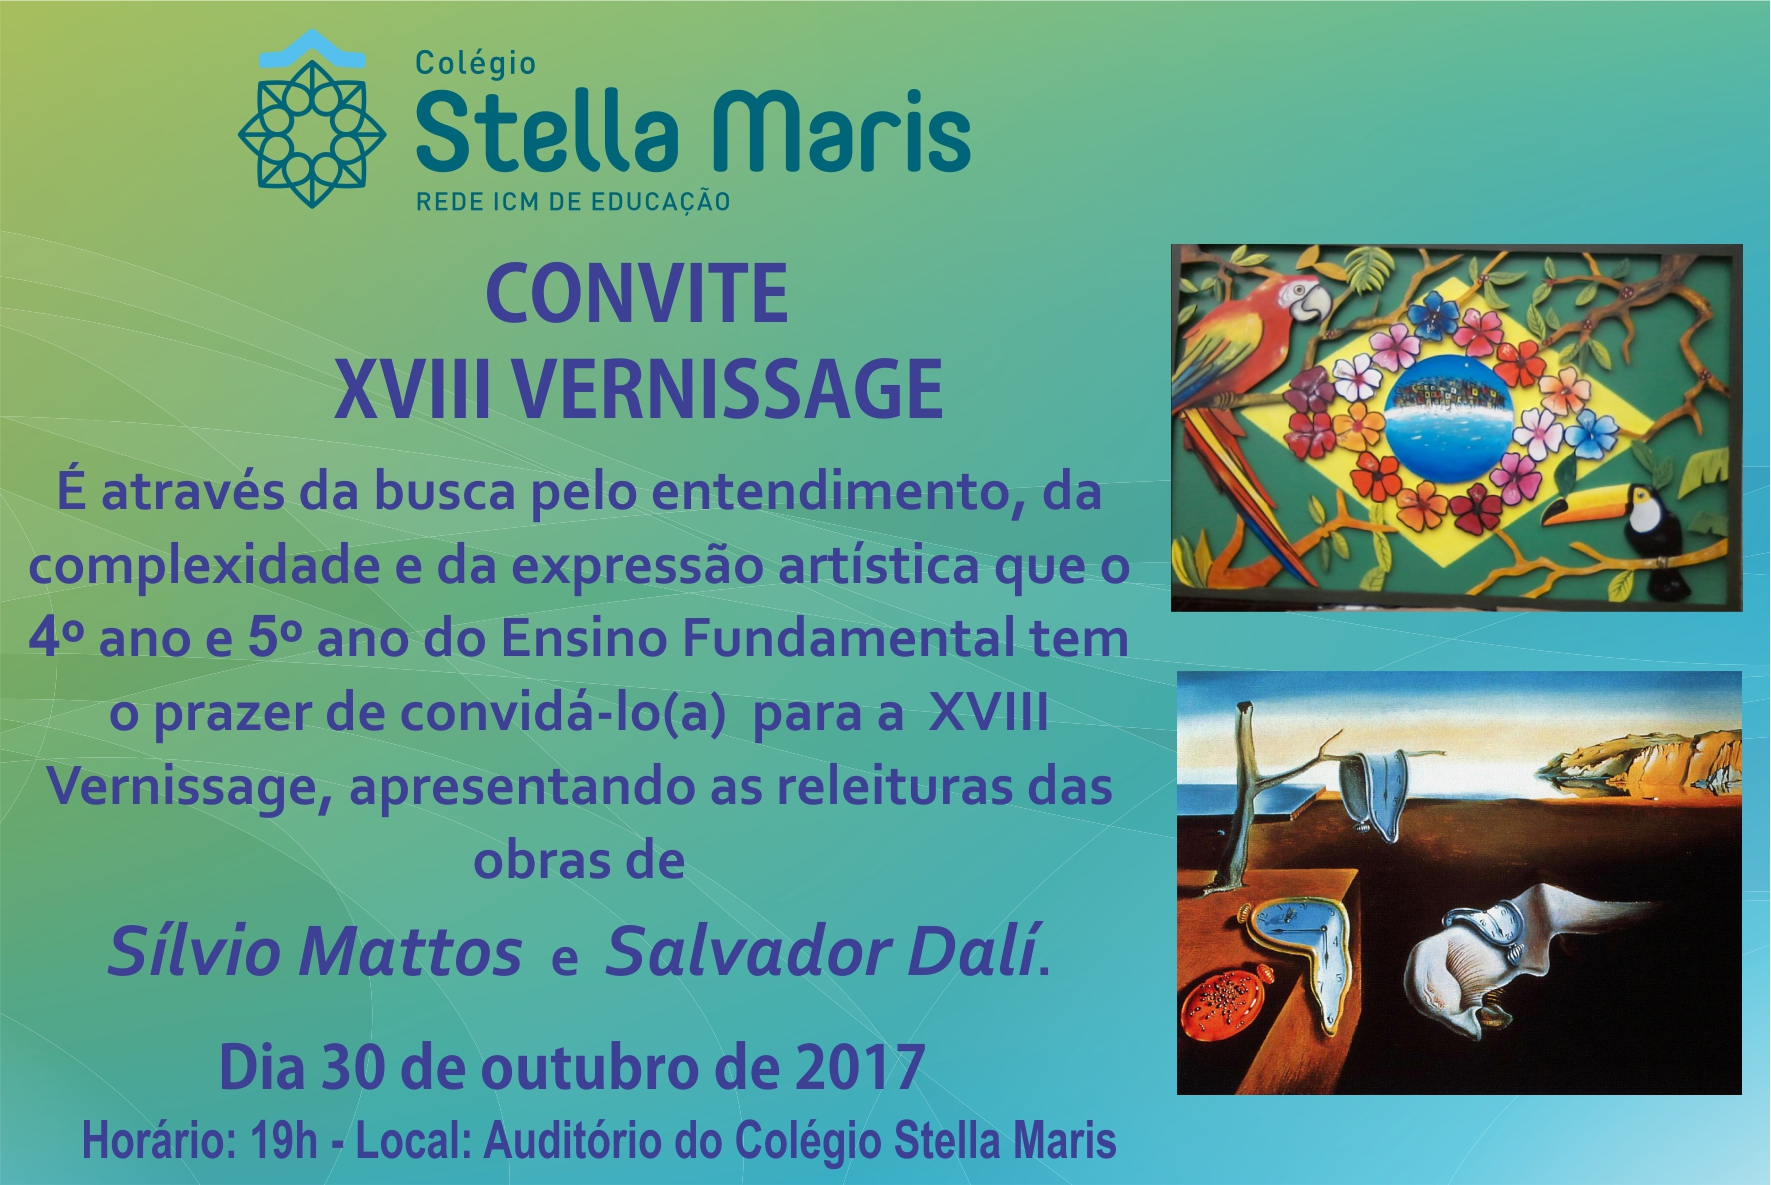 Convite para XVIII Vernissage